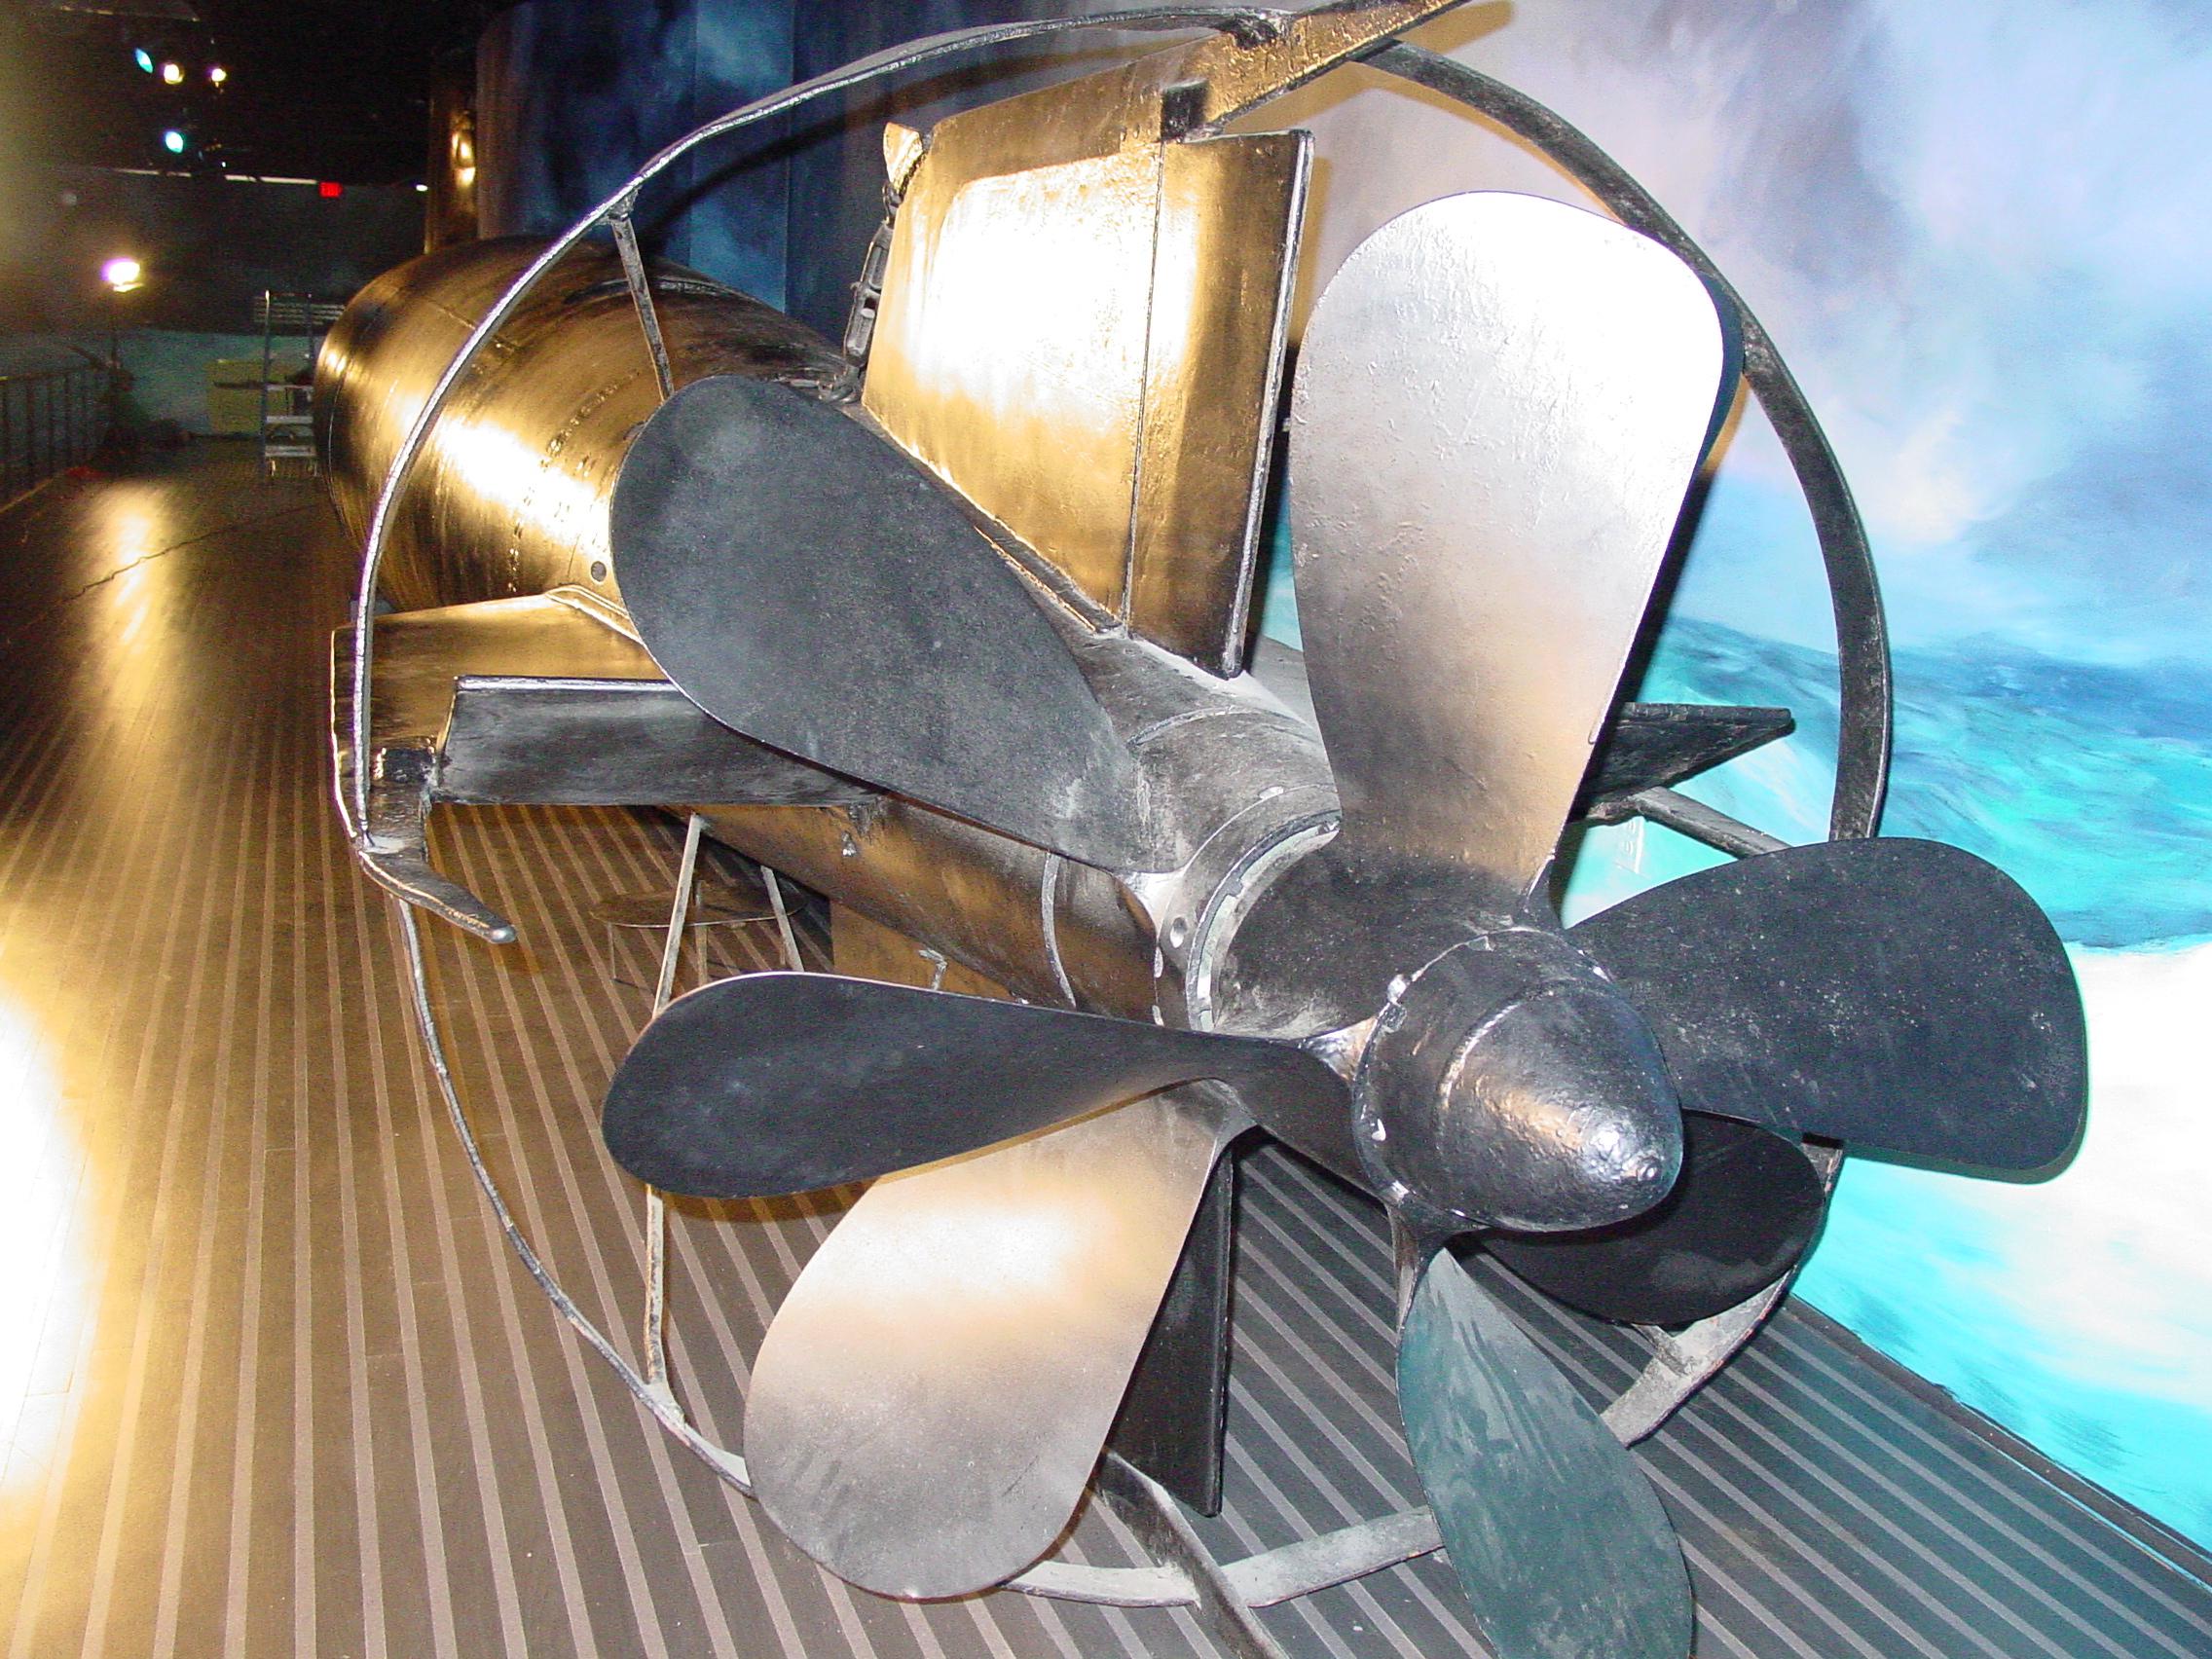 Hawaii Undersea Research Laboratory: Maritime Heritage Gallery